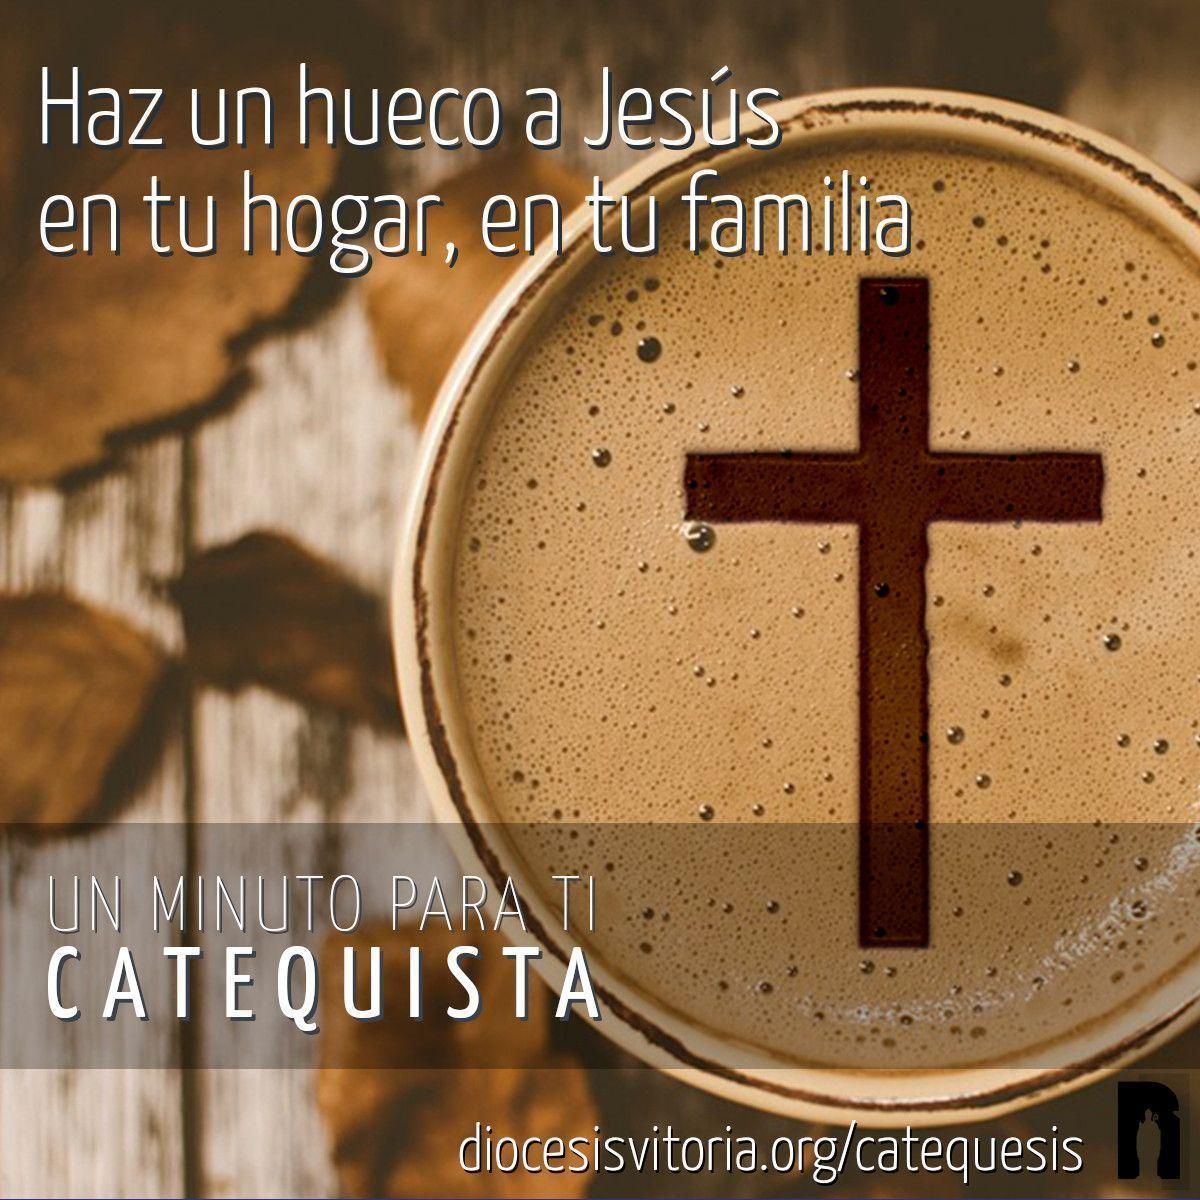 Haz un hueco a Jesús en tu hogar, en tu familia